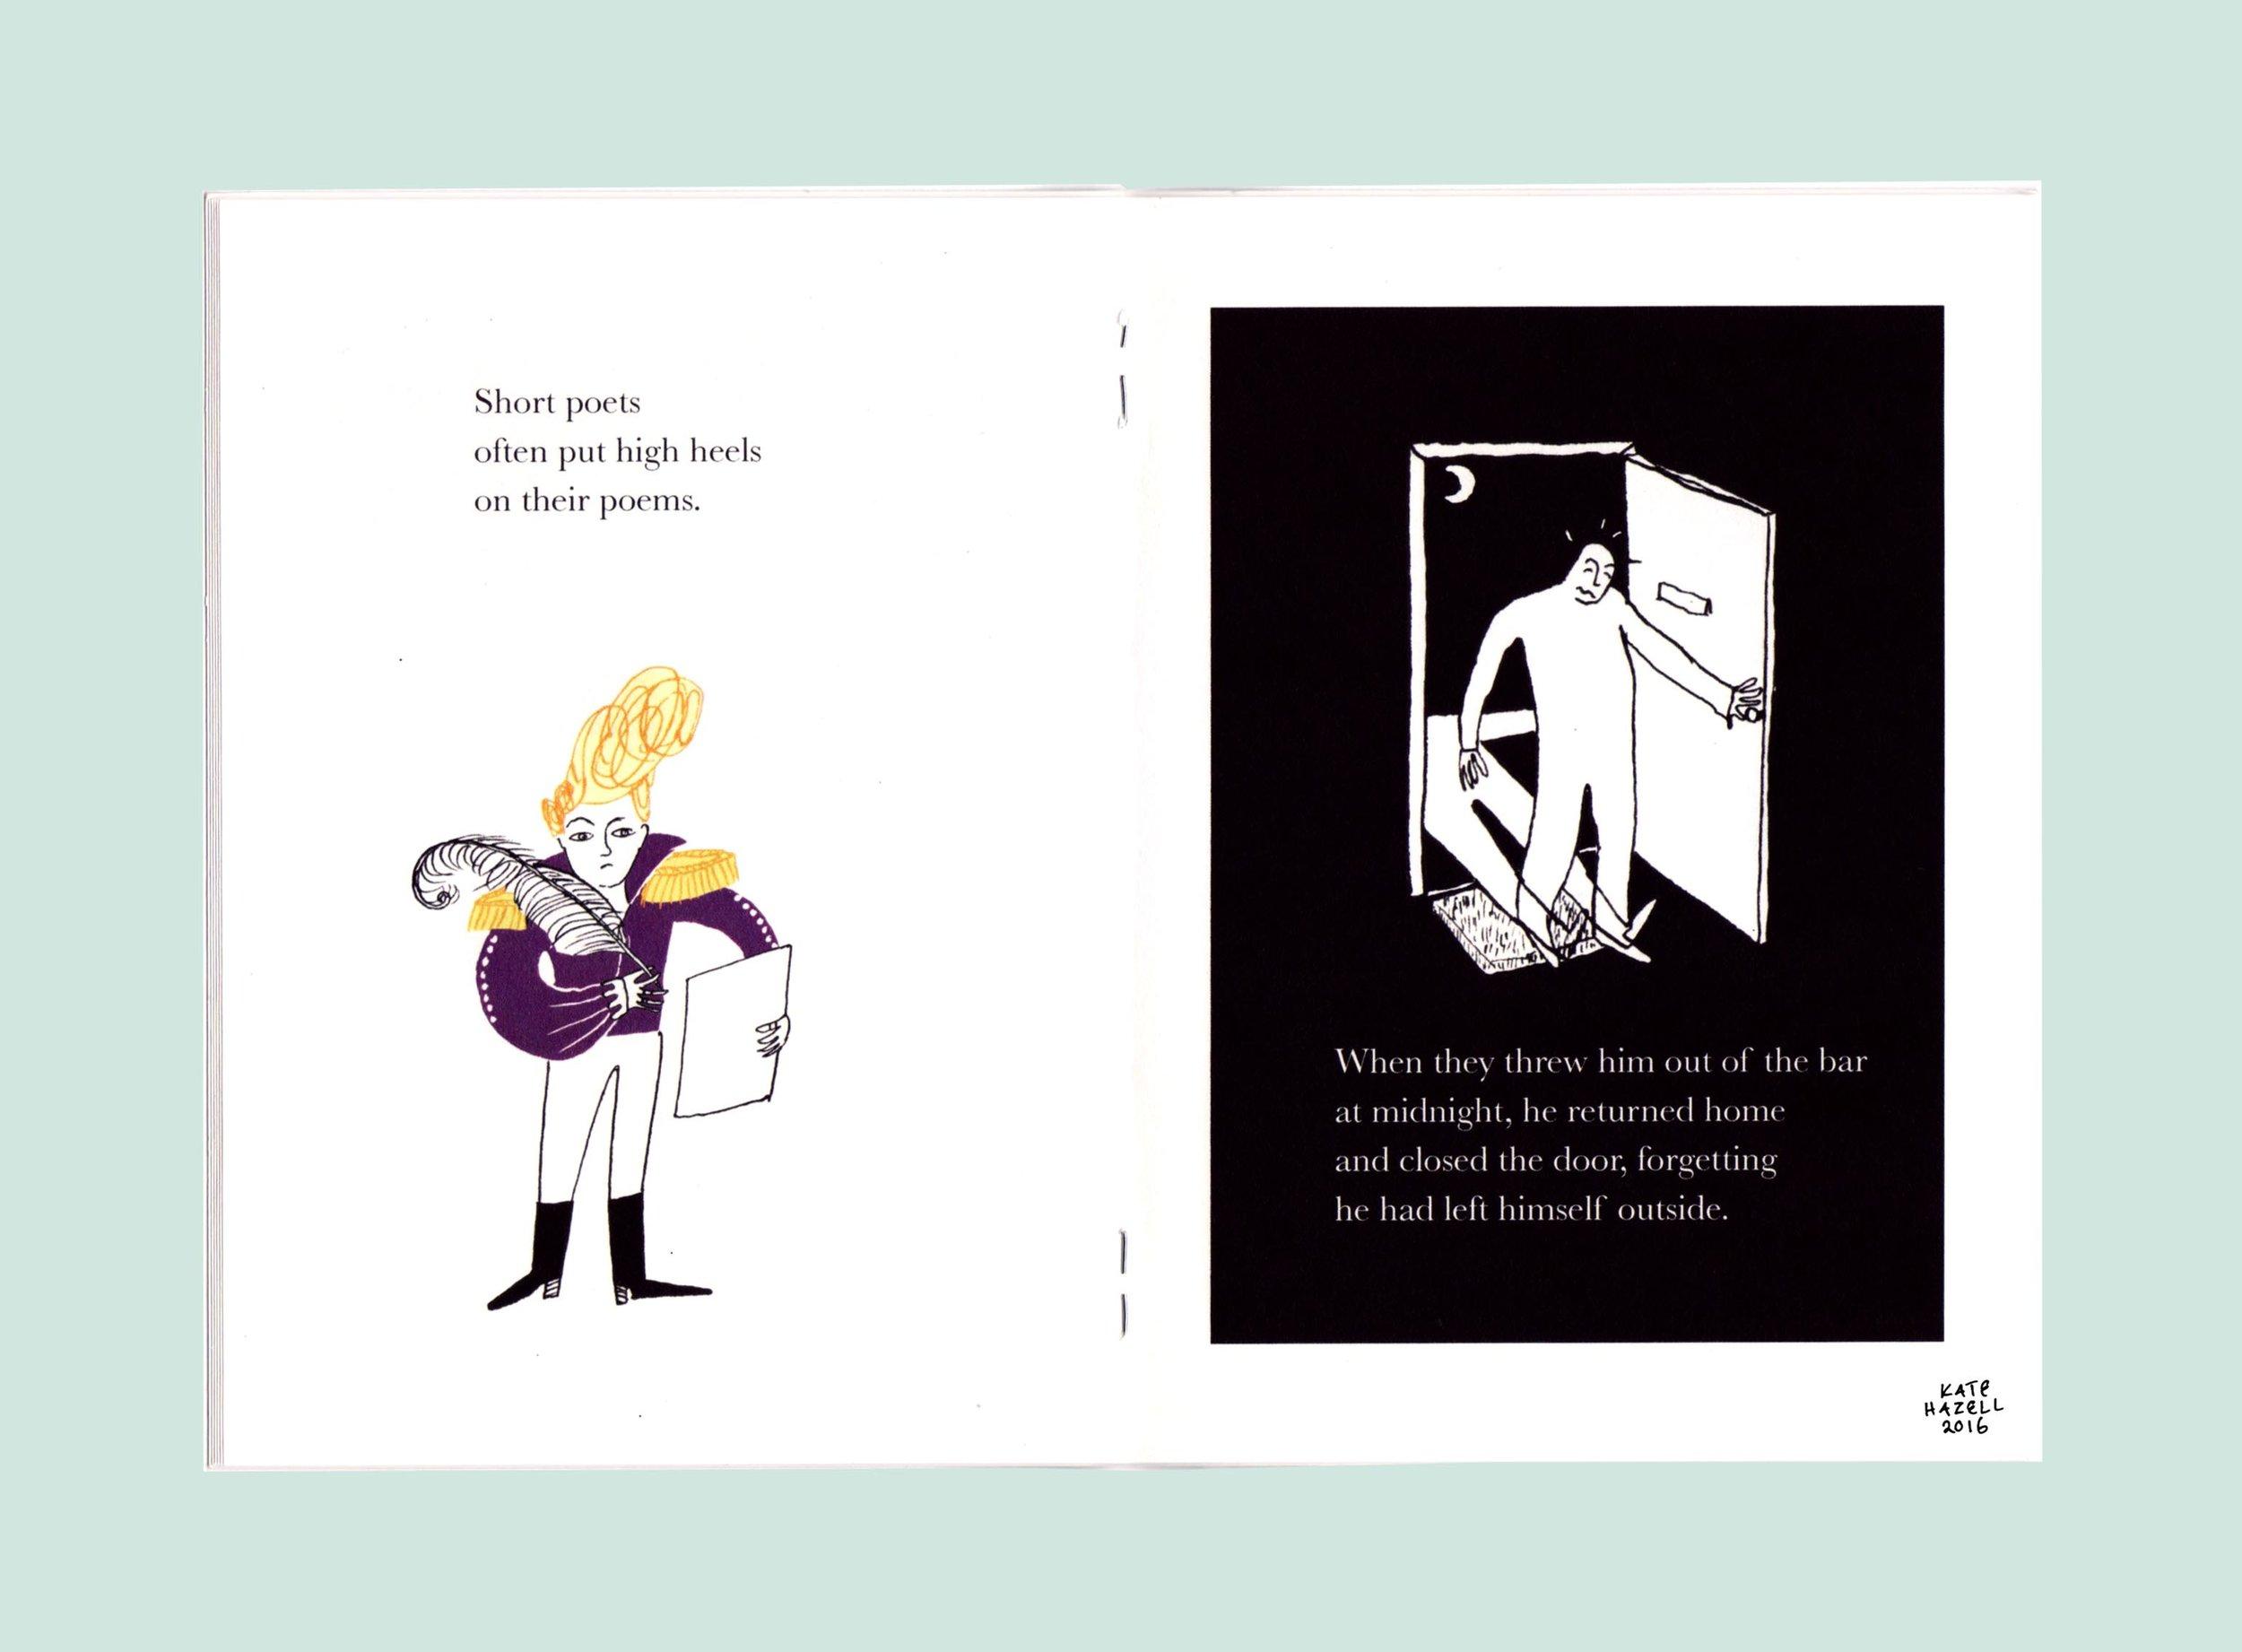 P5_Kate Hazell 10 Poems.jpg